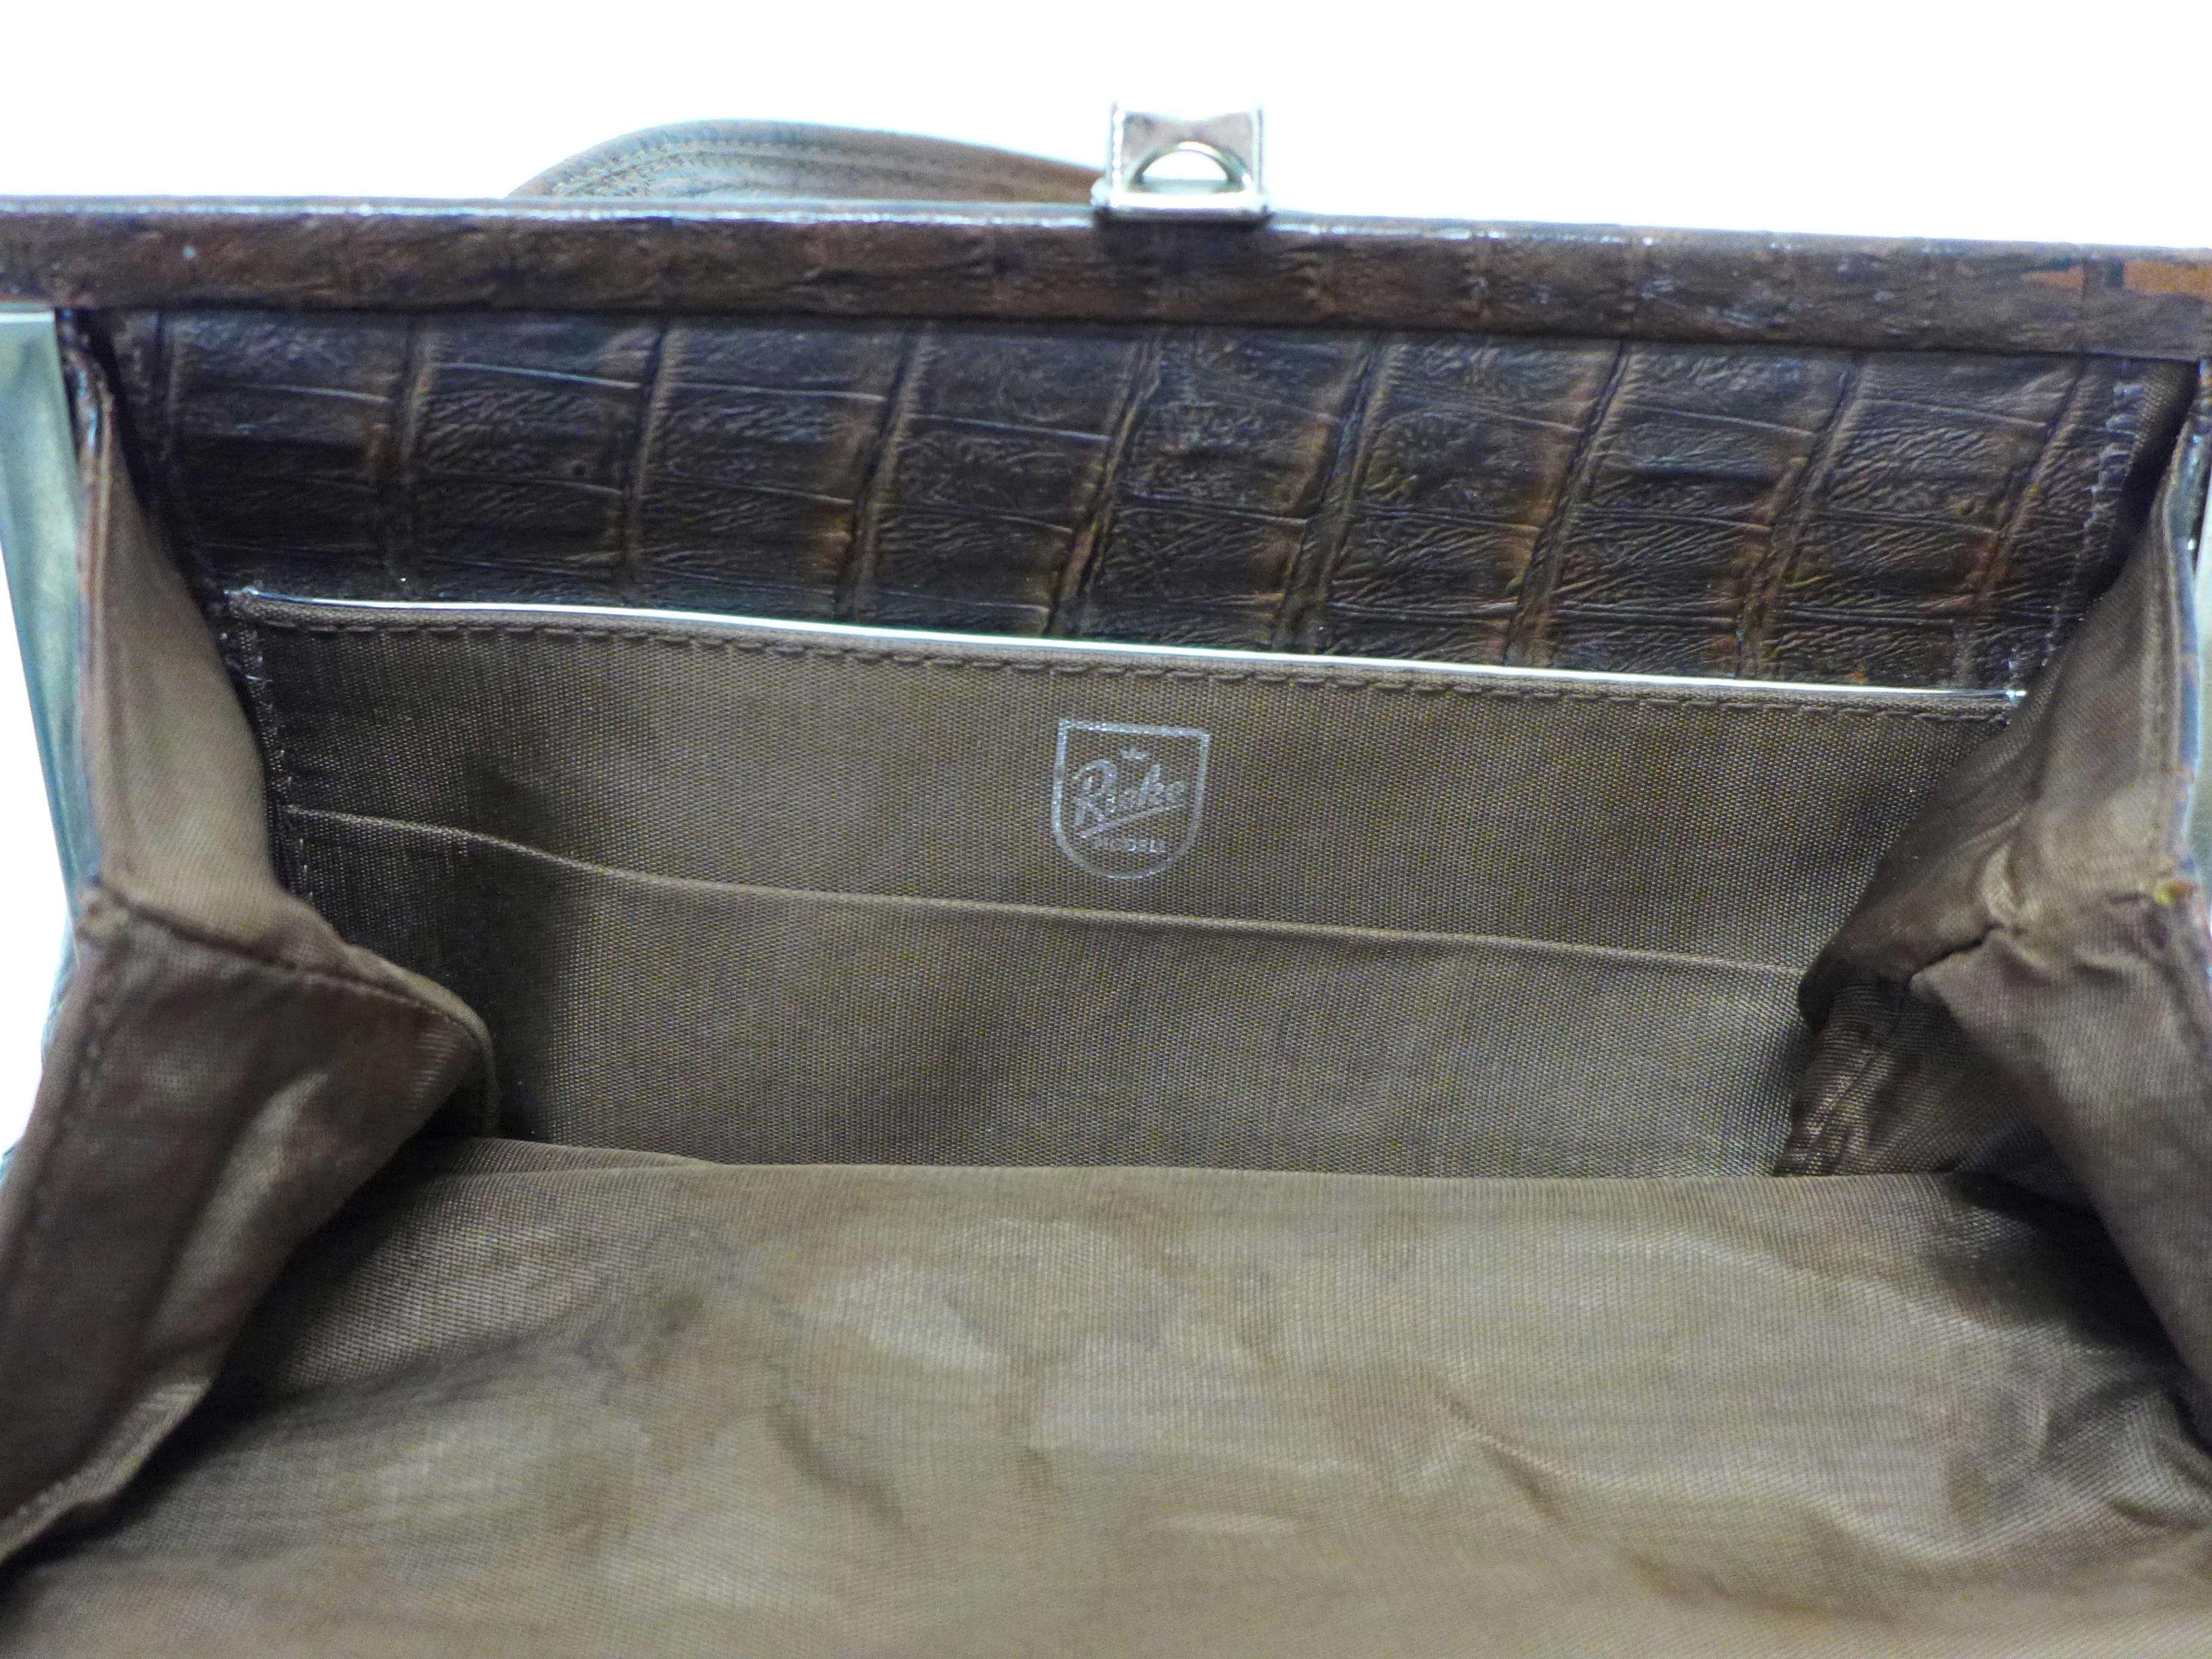 A Rieke vintage faux crocodile skin handbag - Image 3 of 4